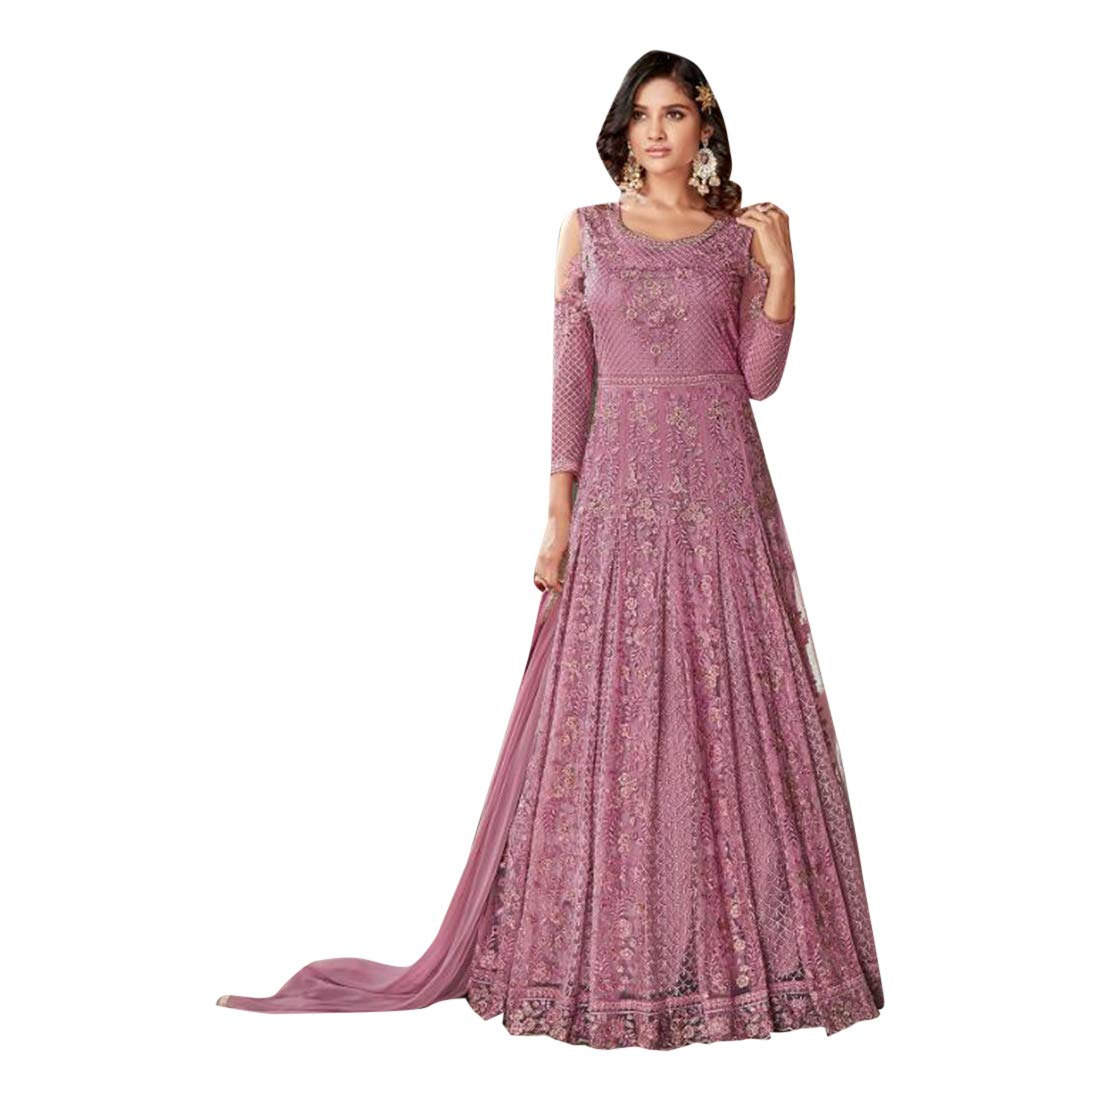 faaa421d08 SHRI BALAJI SILK & COTTON SAREE EMPORIUM Pakistani Wedding Collection  Designer Heavy Net Women Salwar Kameez Indian Muslim Ethnic Long Dress  7388: ...